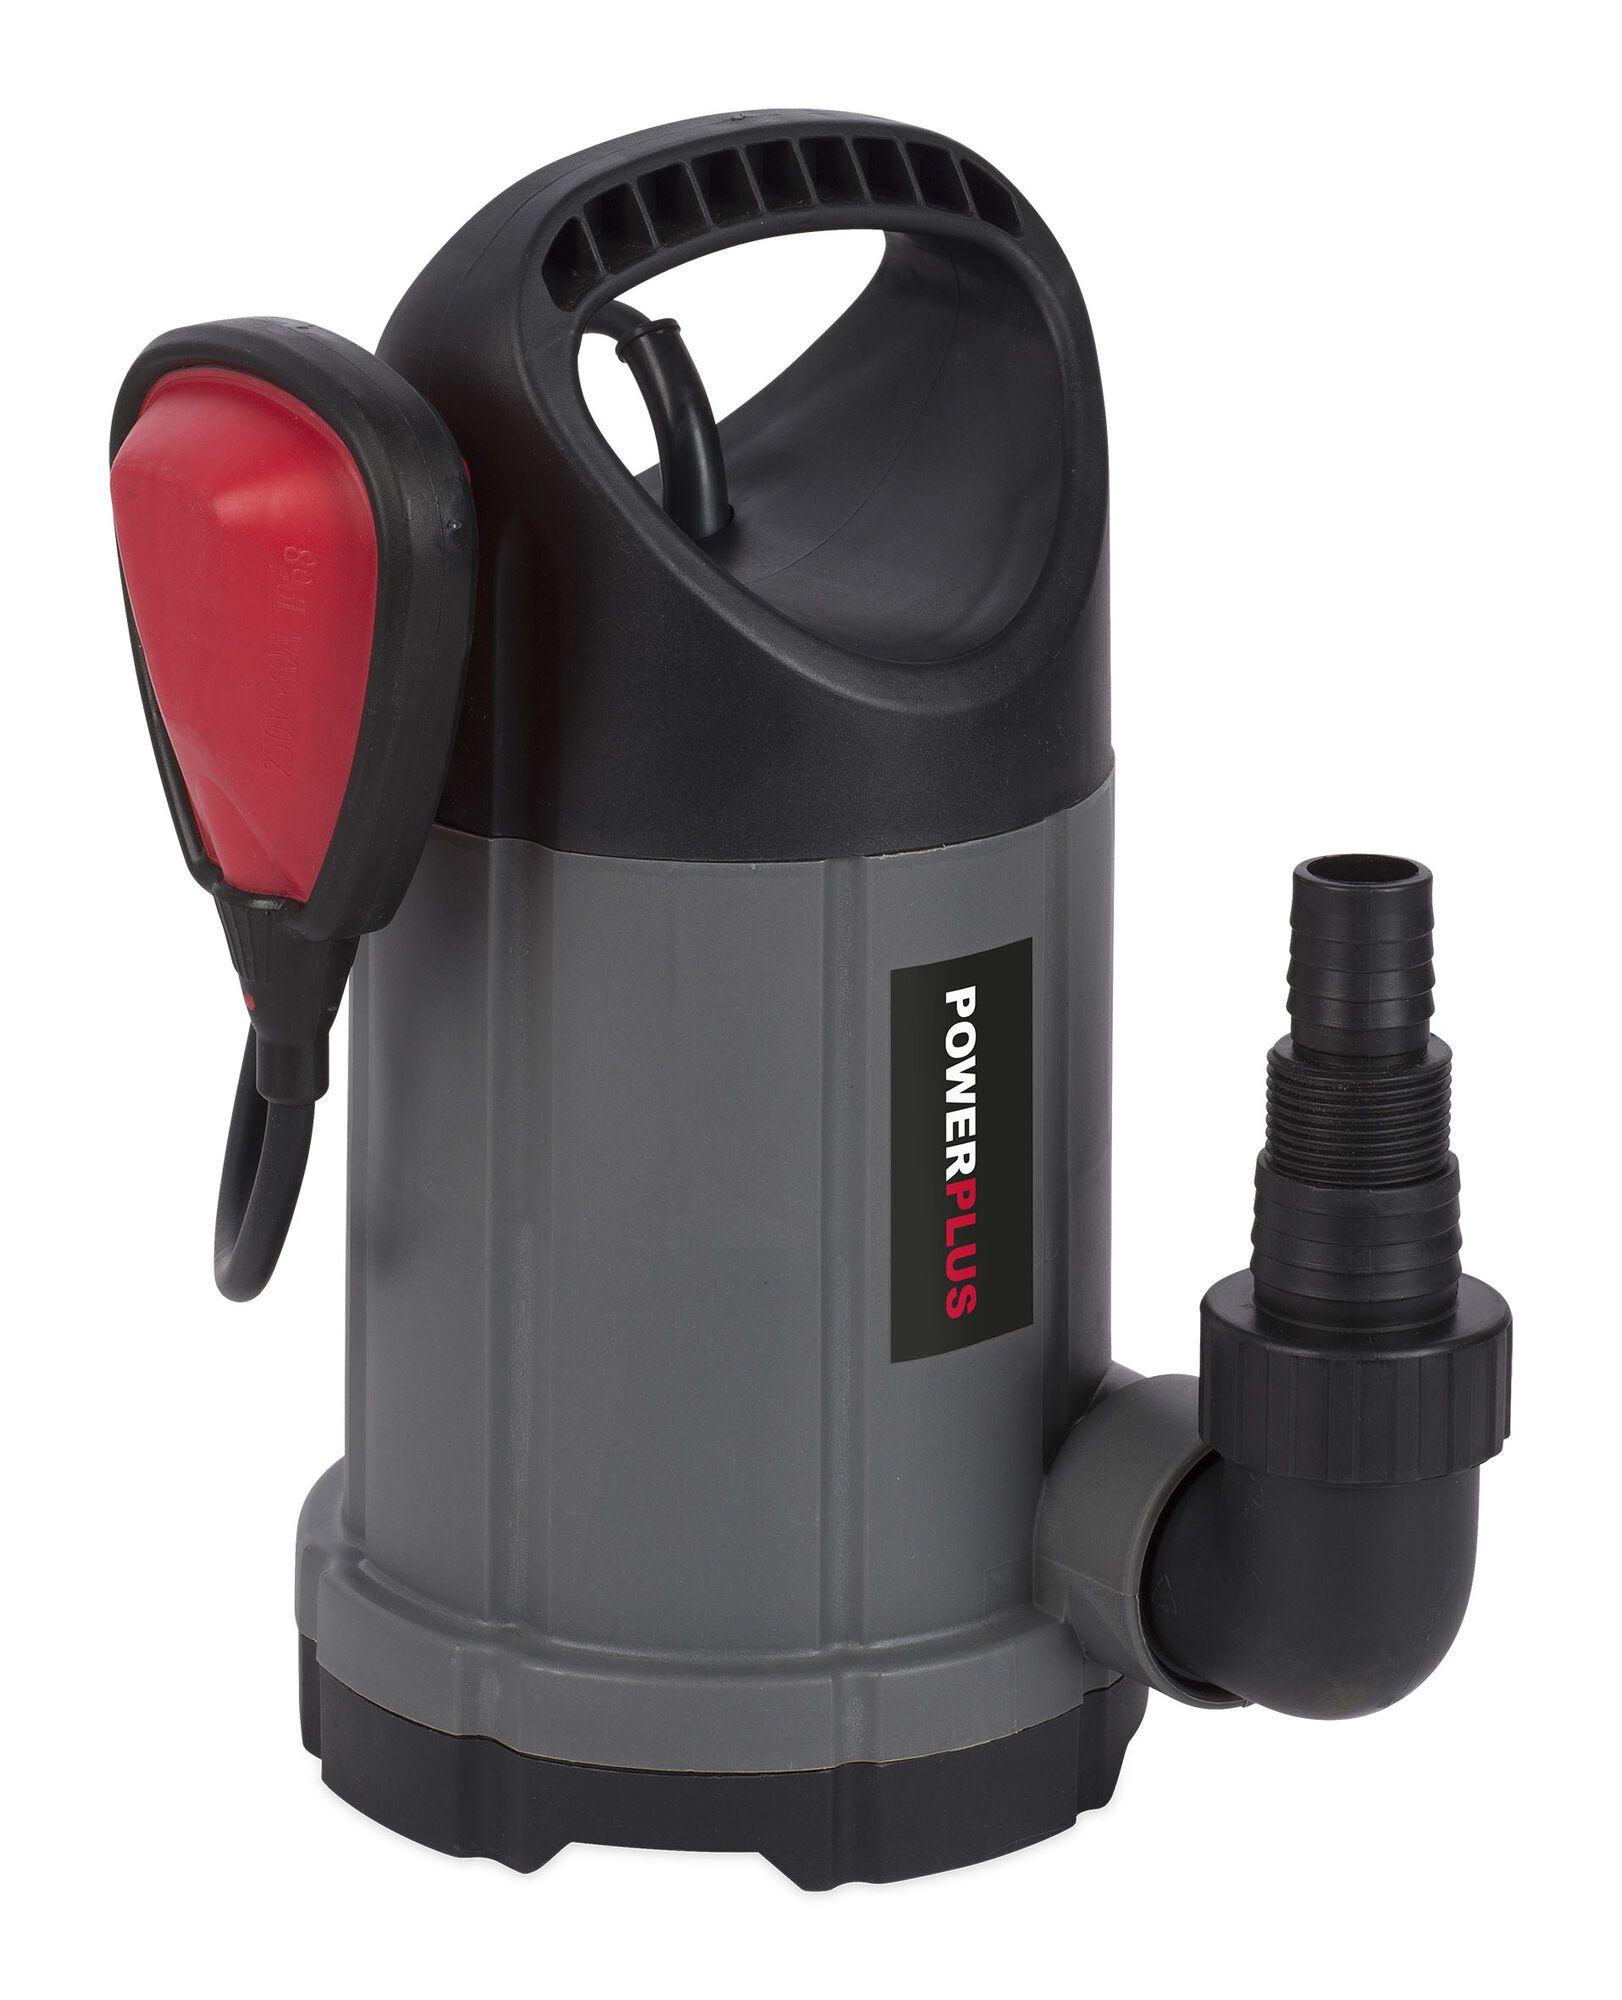 Powerplus POWEW67902 Dompelpomp 250 W | Dompelpomp en dweilpomp (Waterpomp elektrisch)